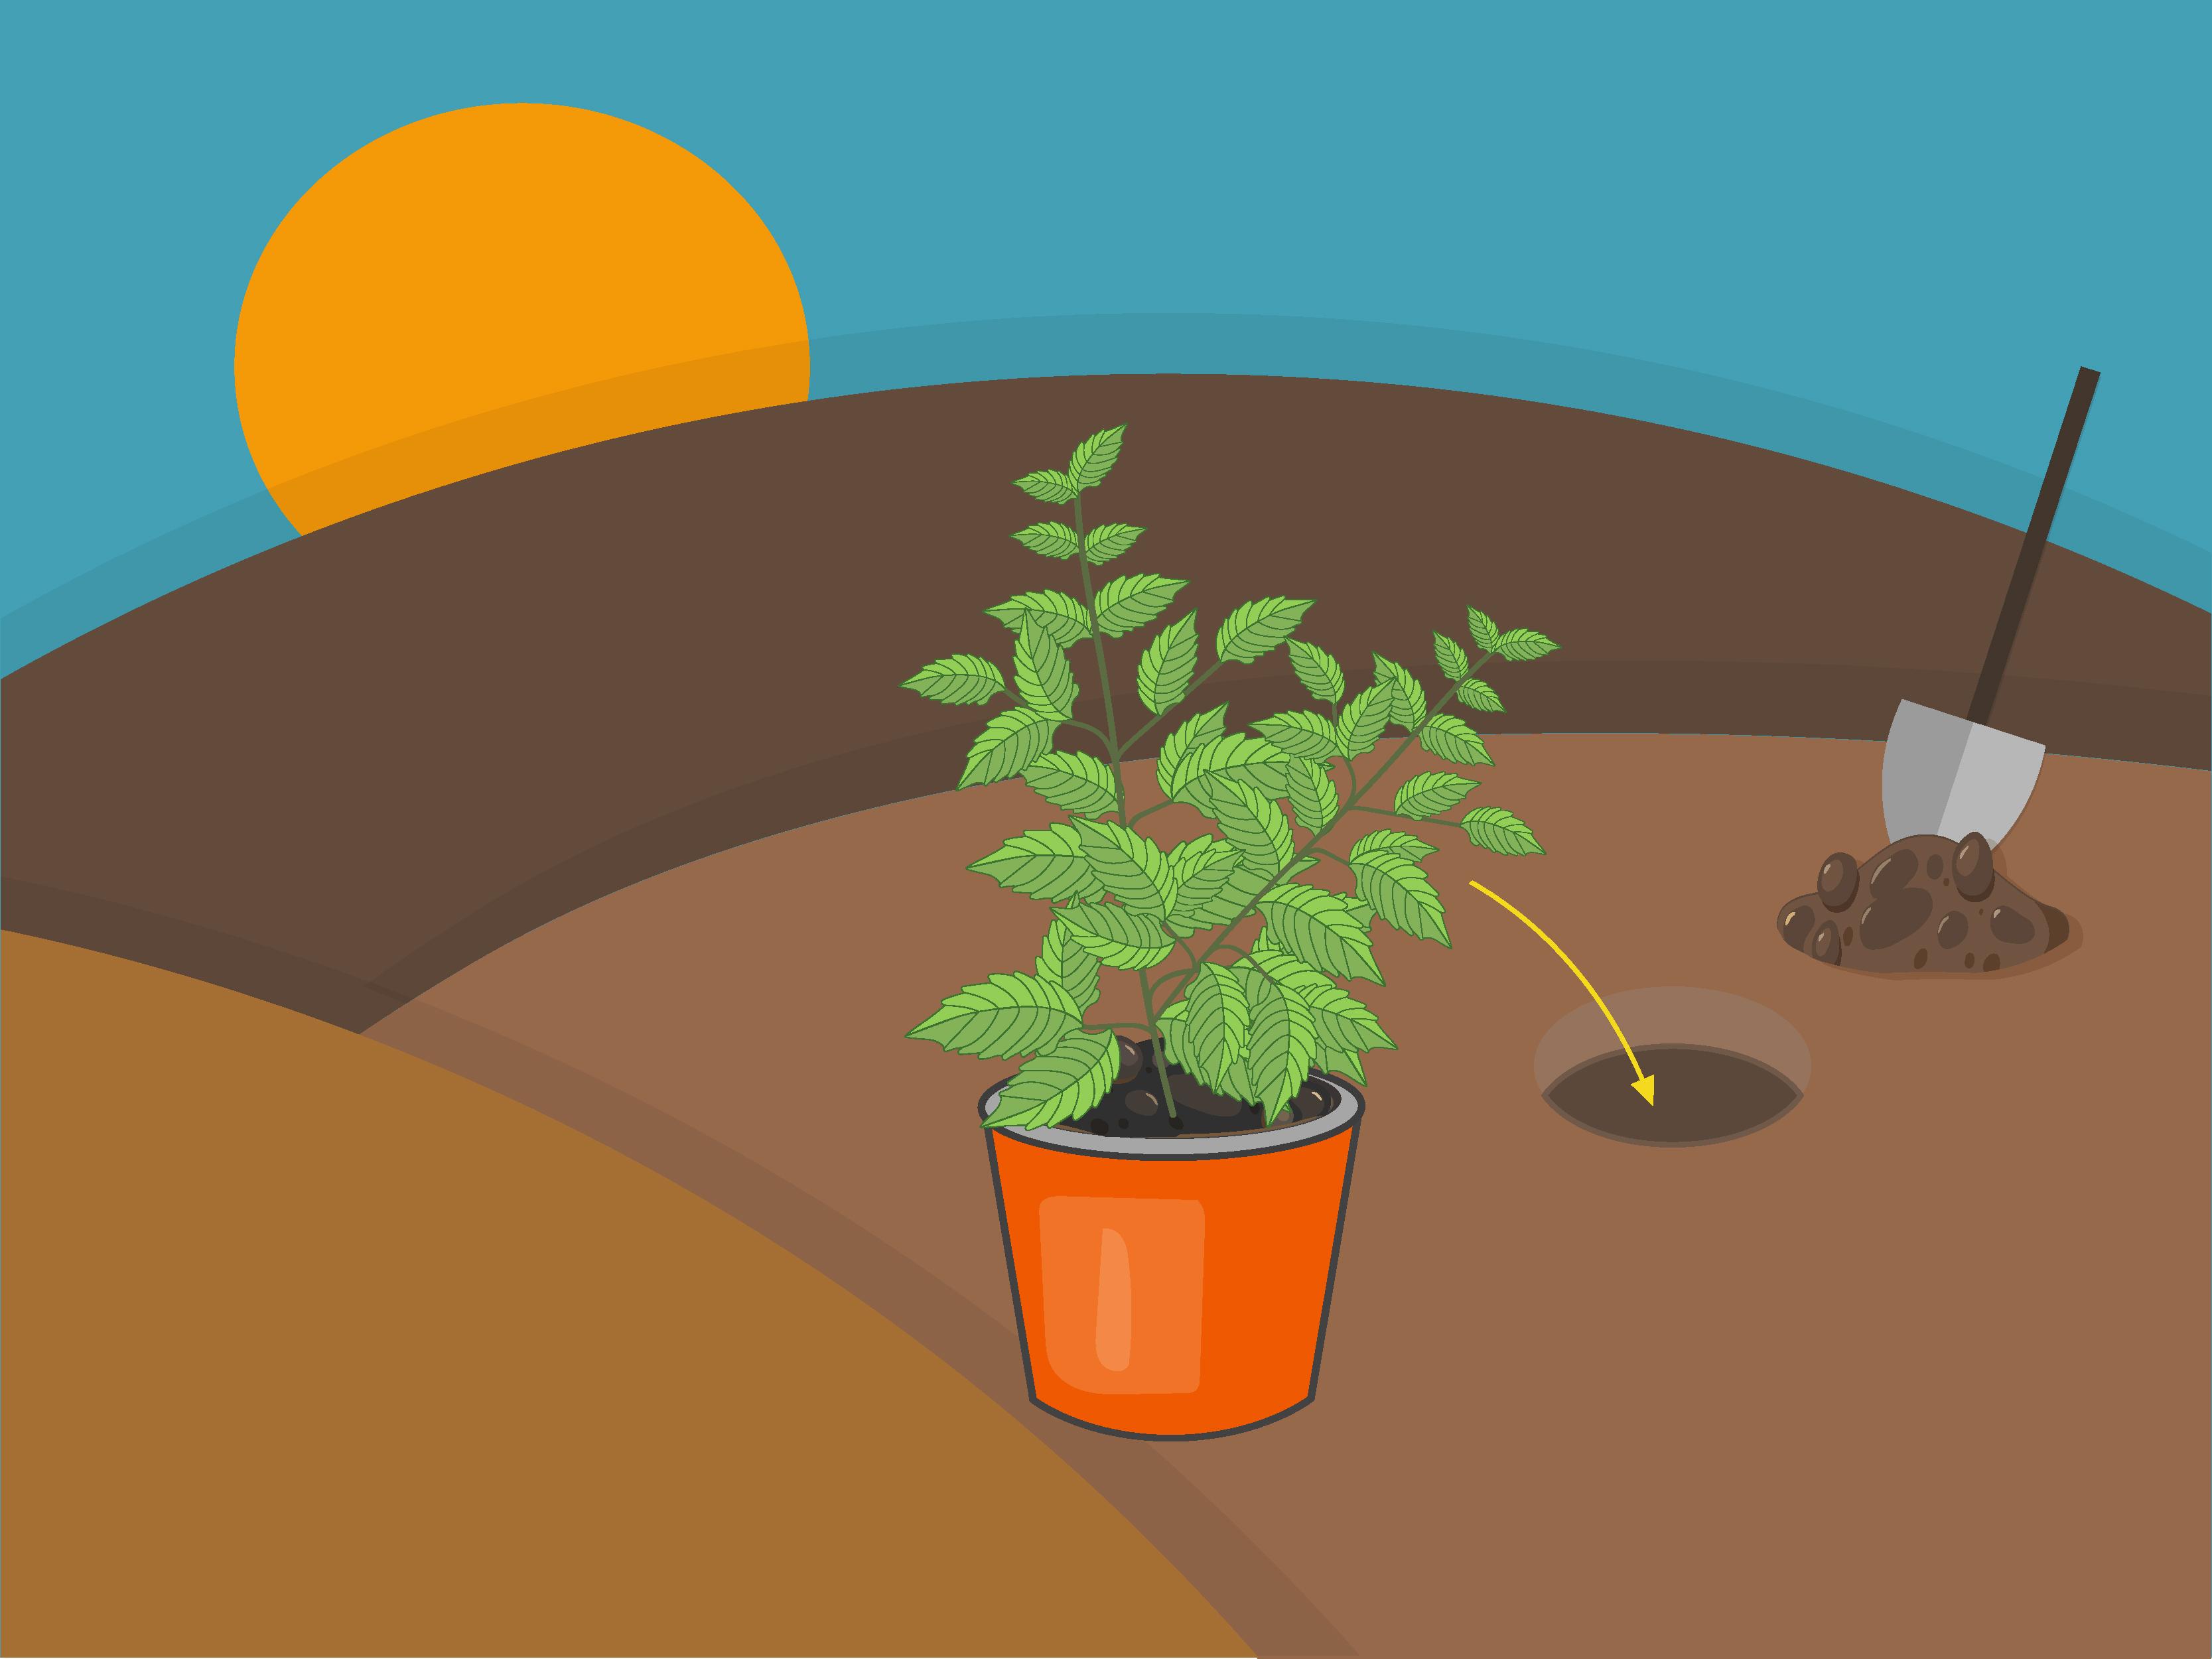 012 Essay Example On Tulsi Plant Grow Step Archaicawful In Hindi Marathi Kannada Full